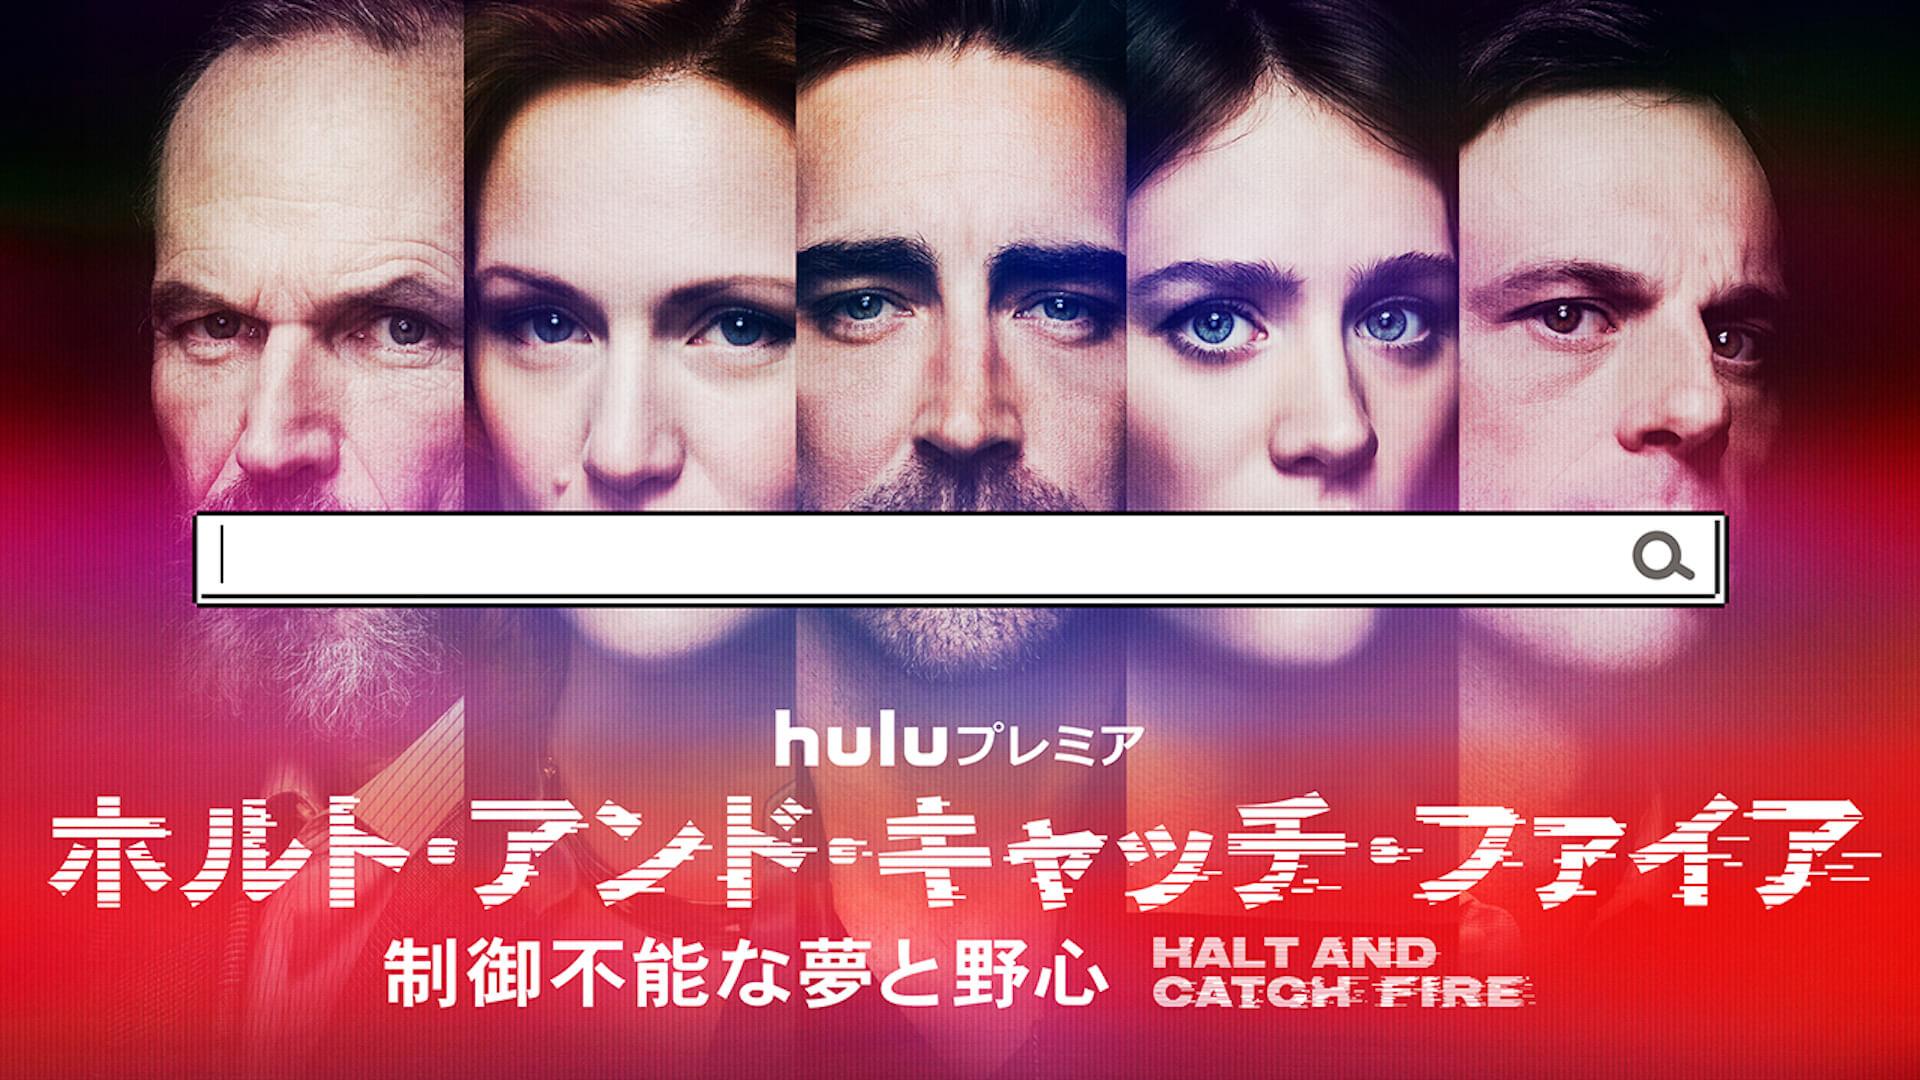 Huluプレミア2020年、年明けから人気ドラマの新シーズンが続々登場|『シェイズ・オブ・ブルー ブルックリン警察』、『ウェントワース女子刑務所』など一挙独占配信 Master_Art_Halt_and_Catch_Fire_S4_small